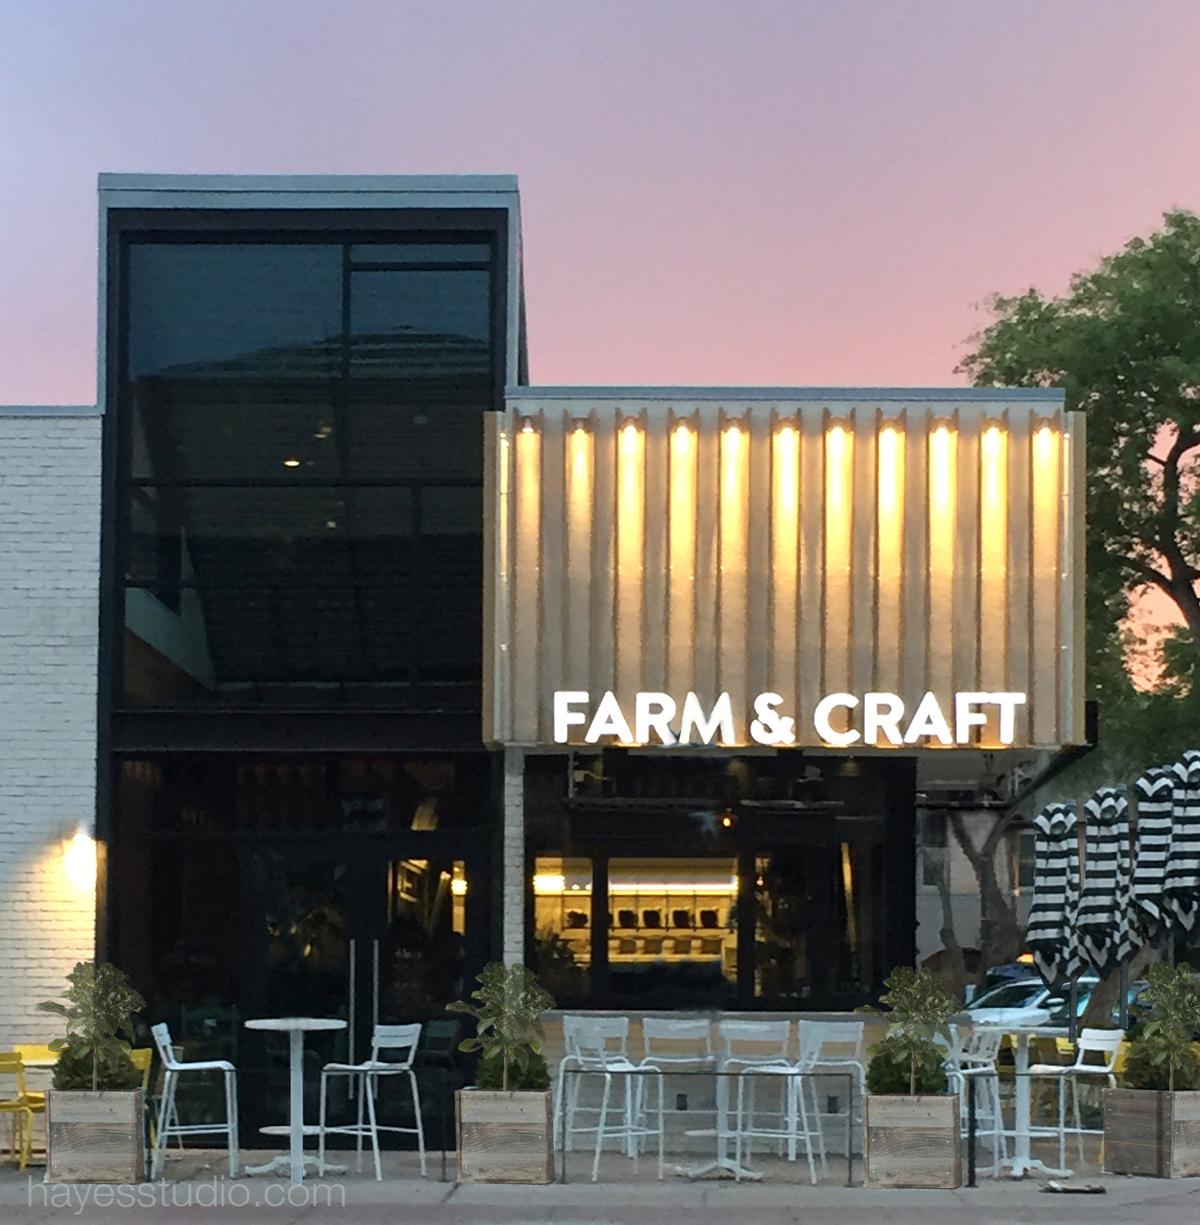 Farm craft scottsdale arizona restaurant architecture for Farm and craft scottsdale